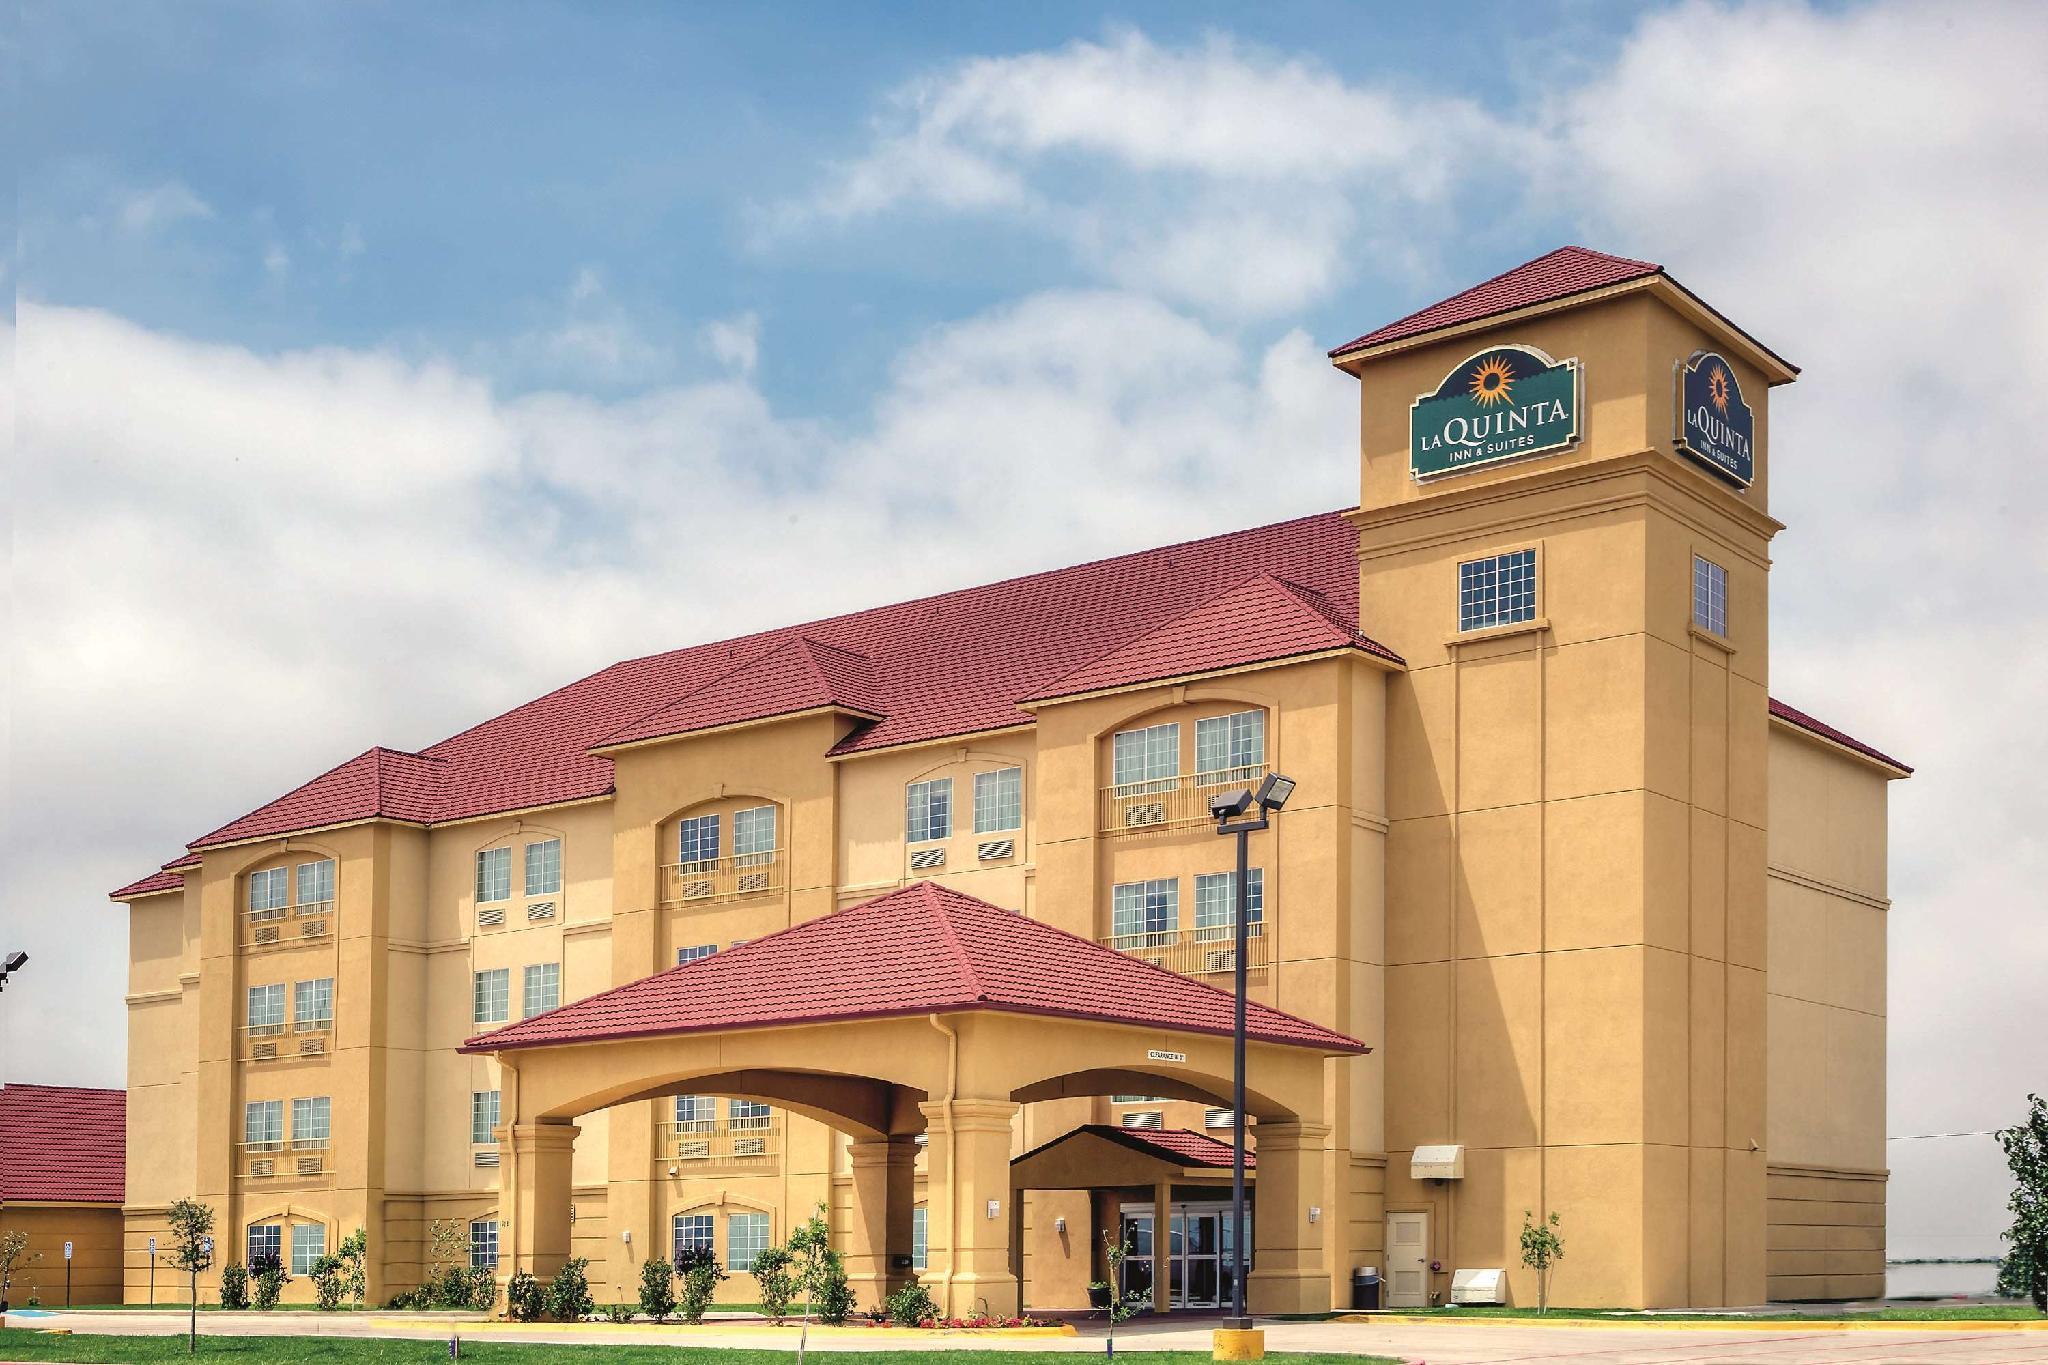 La Quinta Inn And Suites By Wyndham Dumas